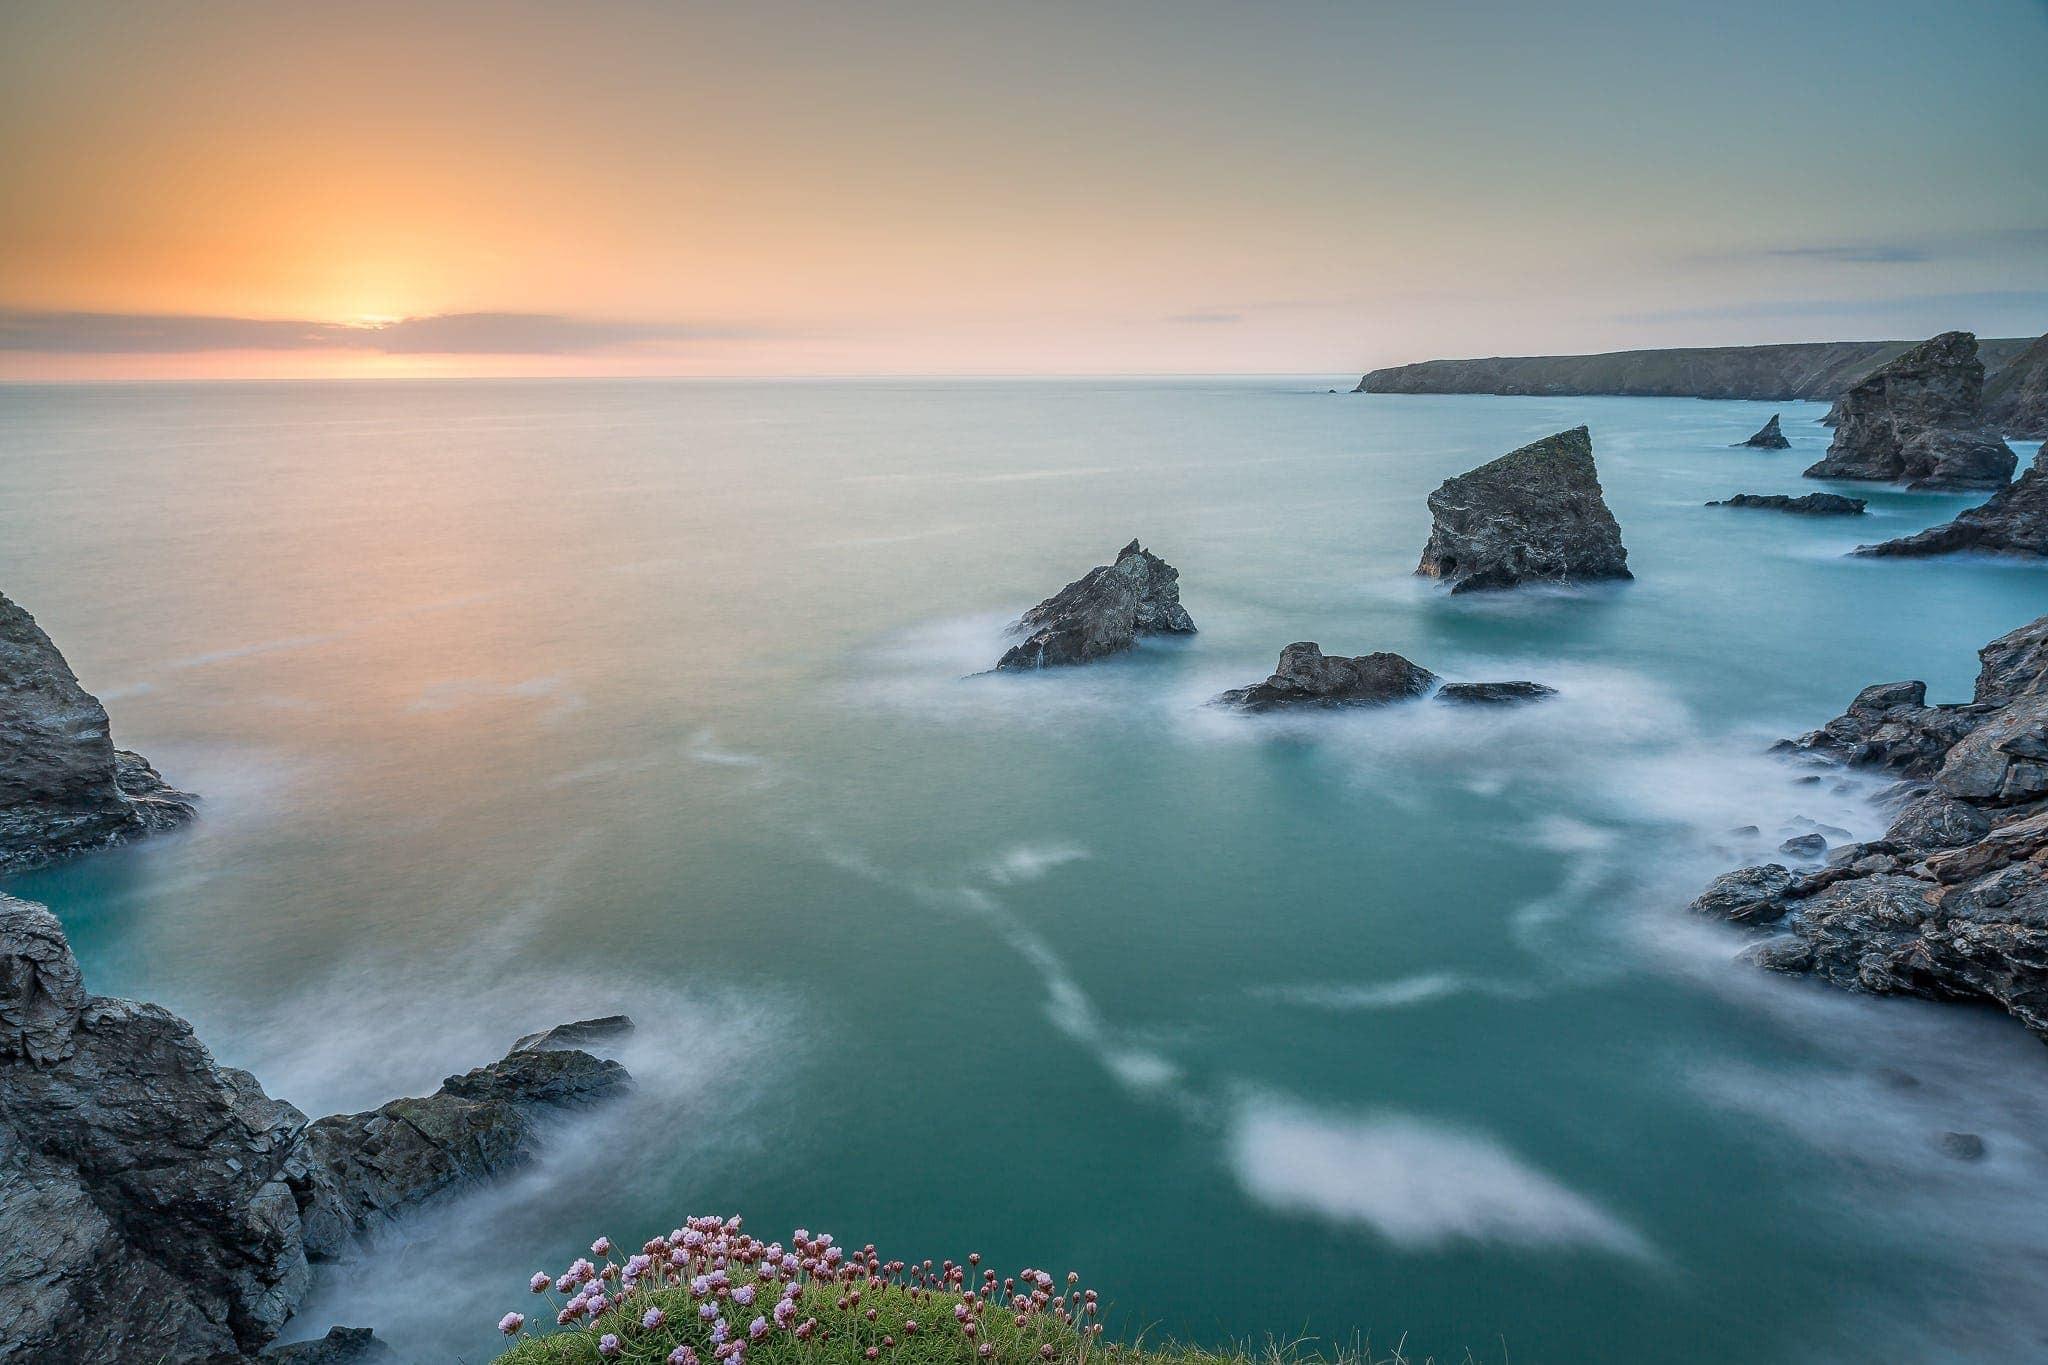 Francesco Gola Seascape Landscape Photography Bedruthan Step Uk Cornwall Long Exposure